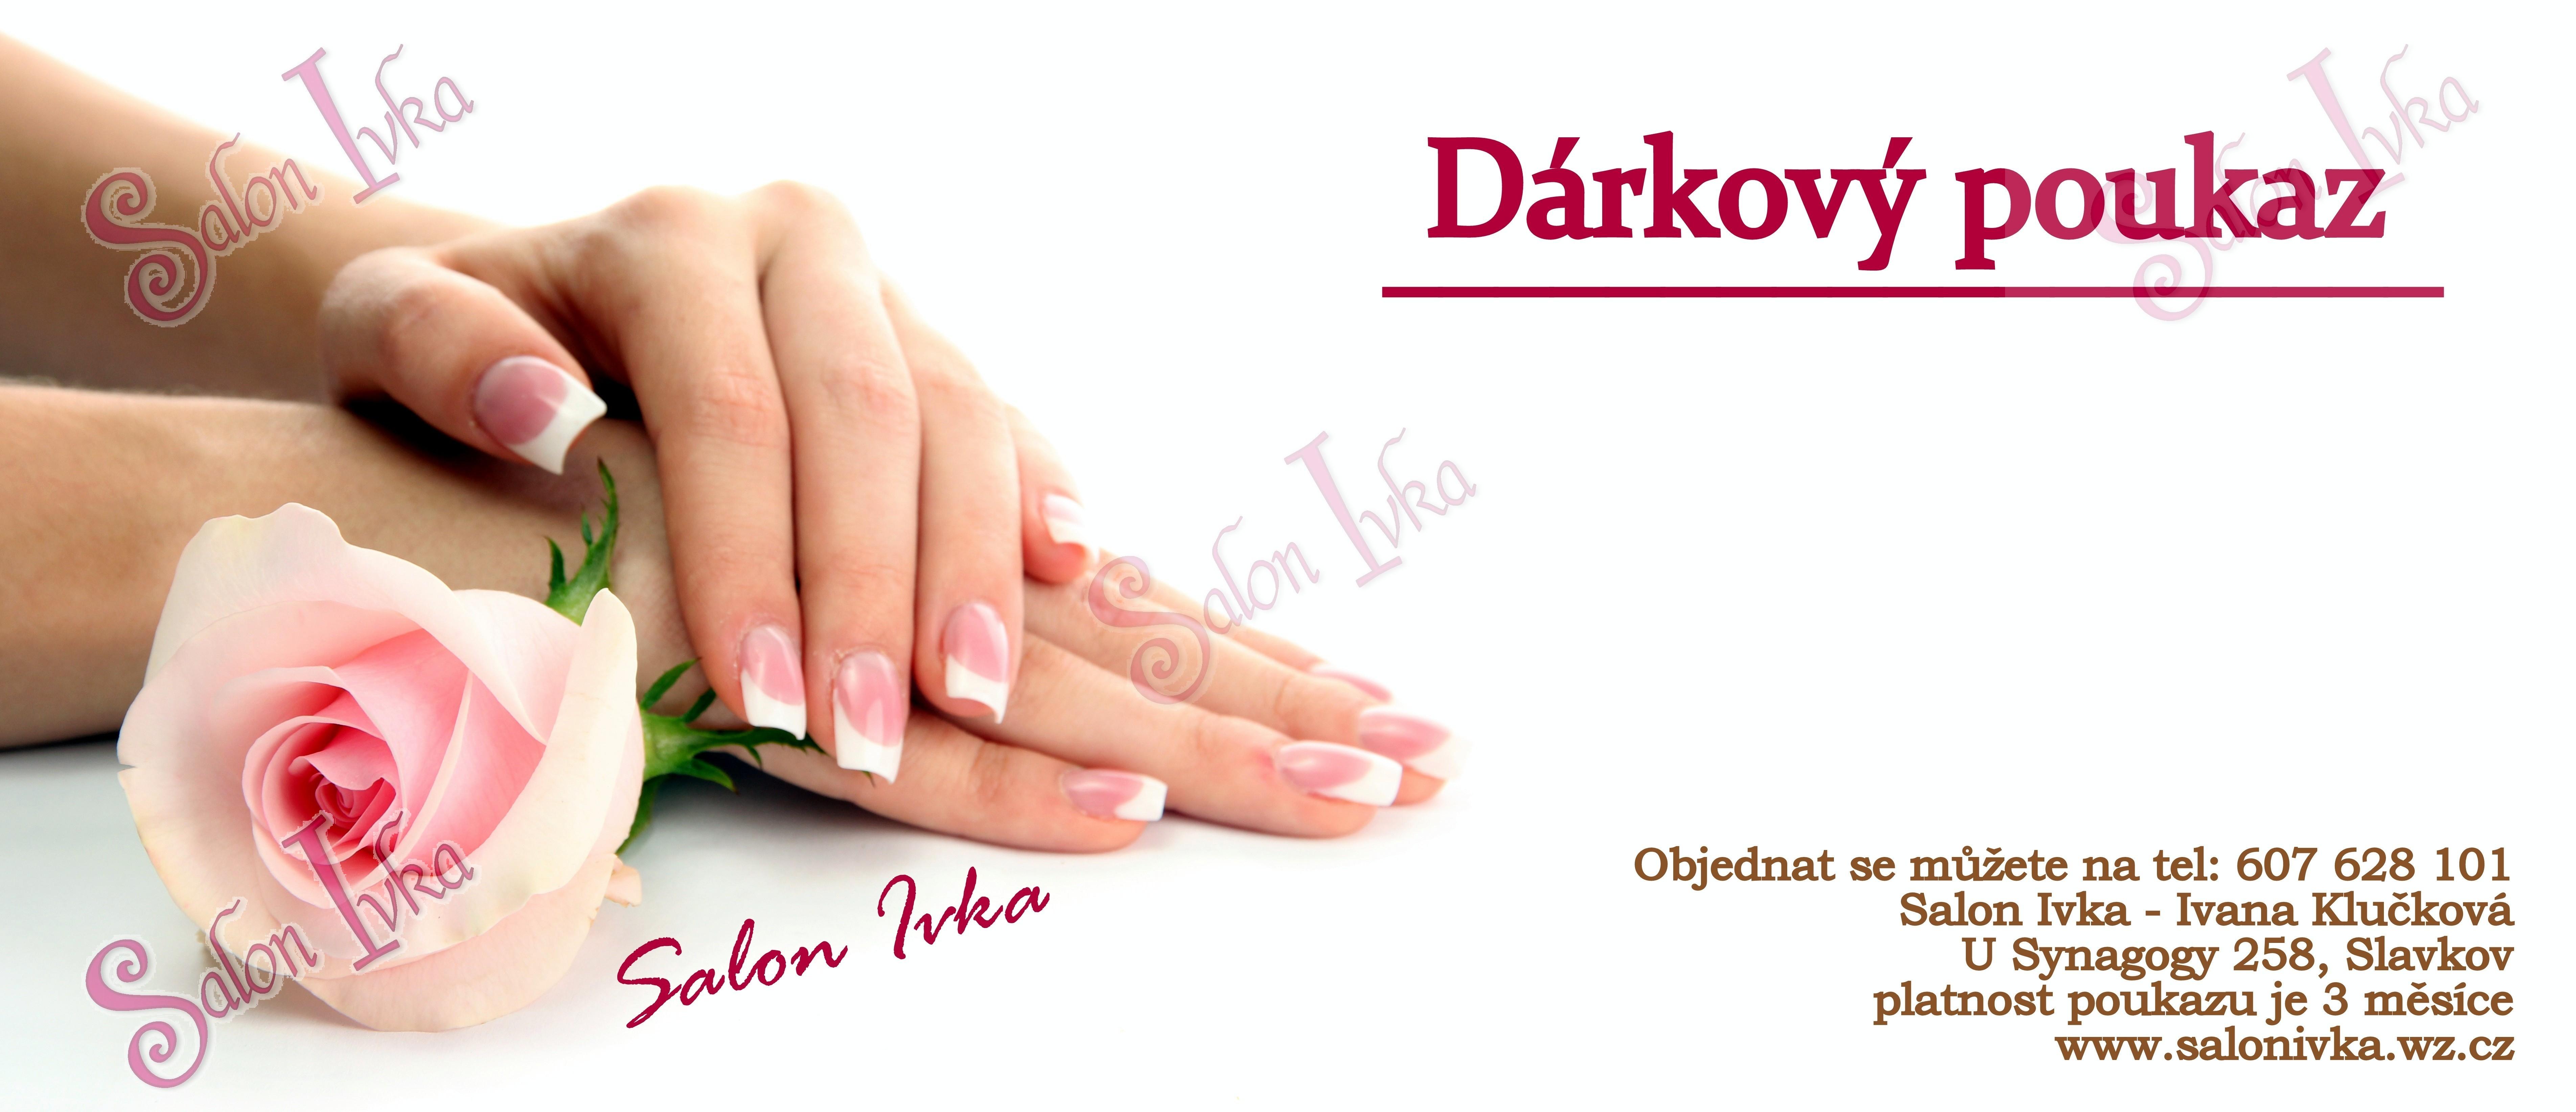 Salon Ivka Darkove Poukazy